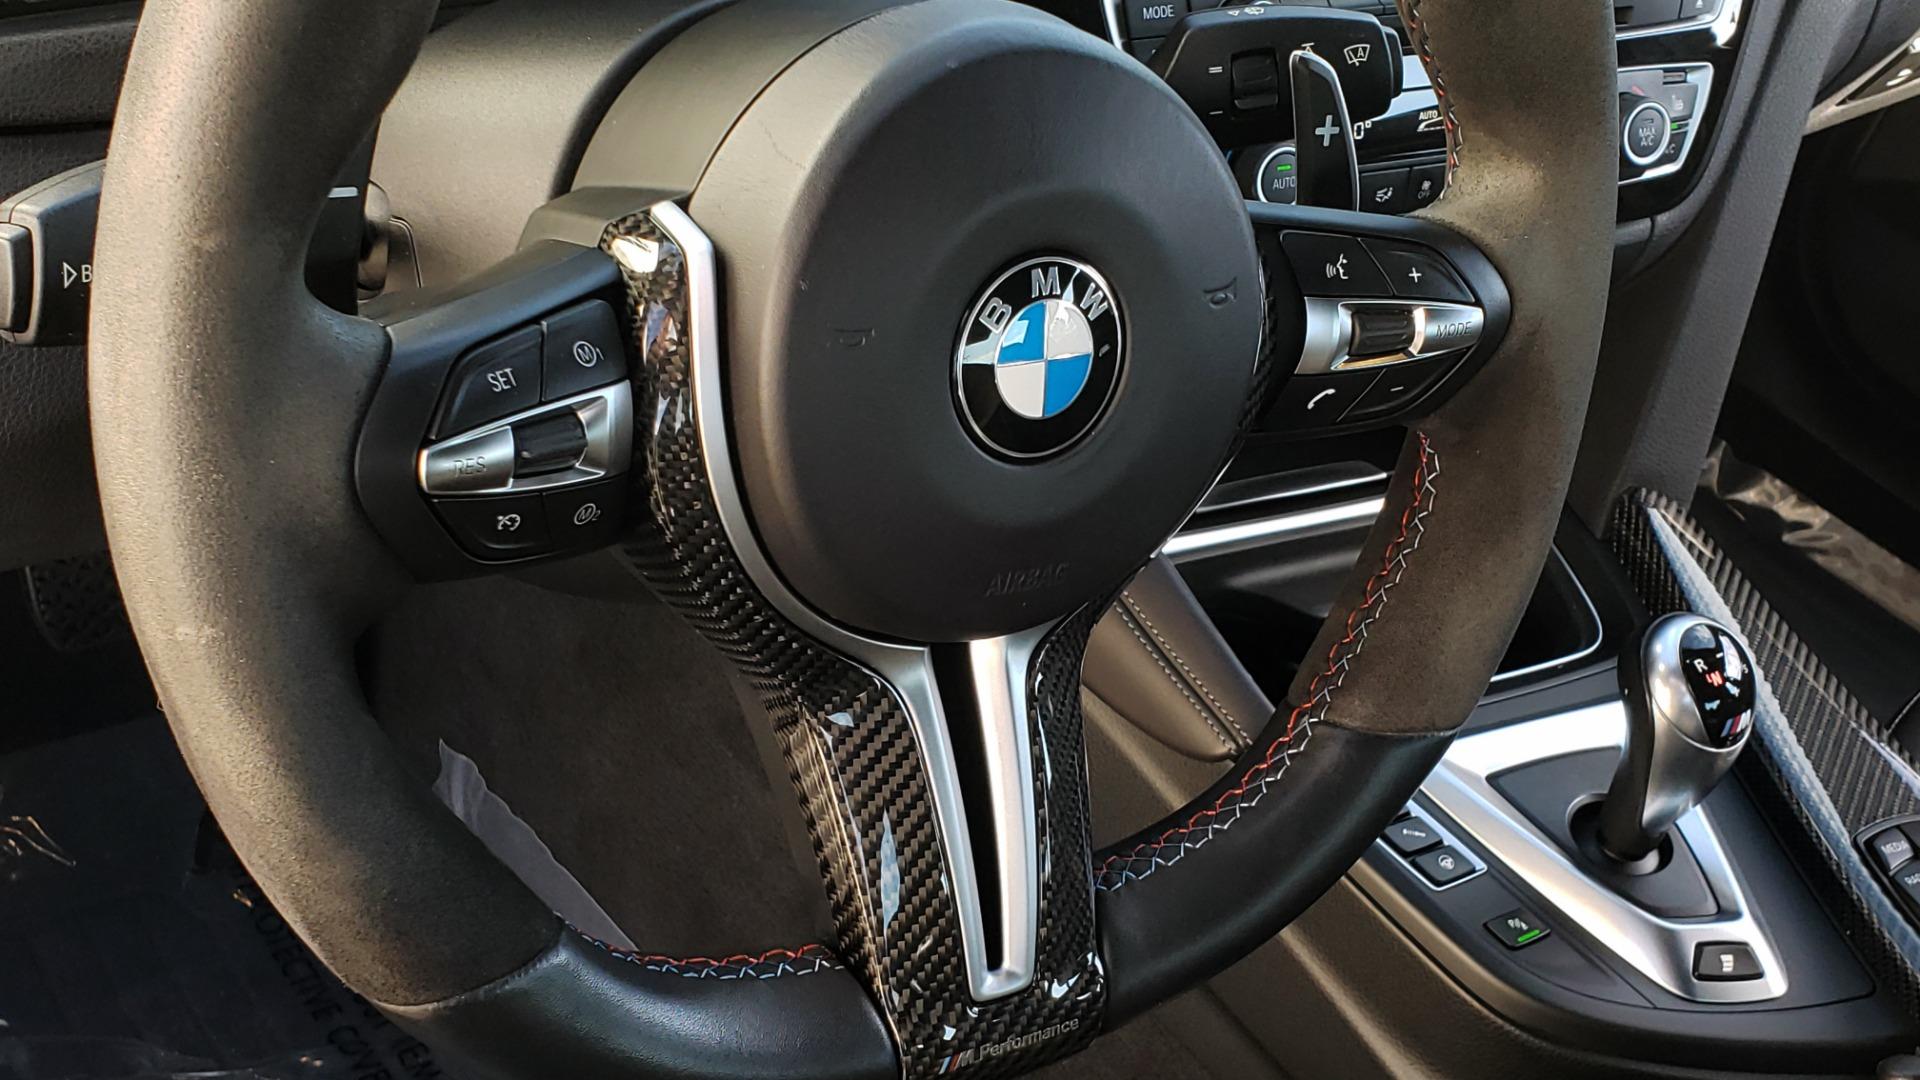 Used 2016 BMW M3 SEDAN / EXECUTIVE PKG / M-SUSPENSION / HARMAN/KARDON SOUND for sale Sold at Formula Imports in Charlotte NC 28227 46